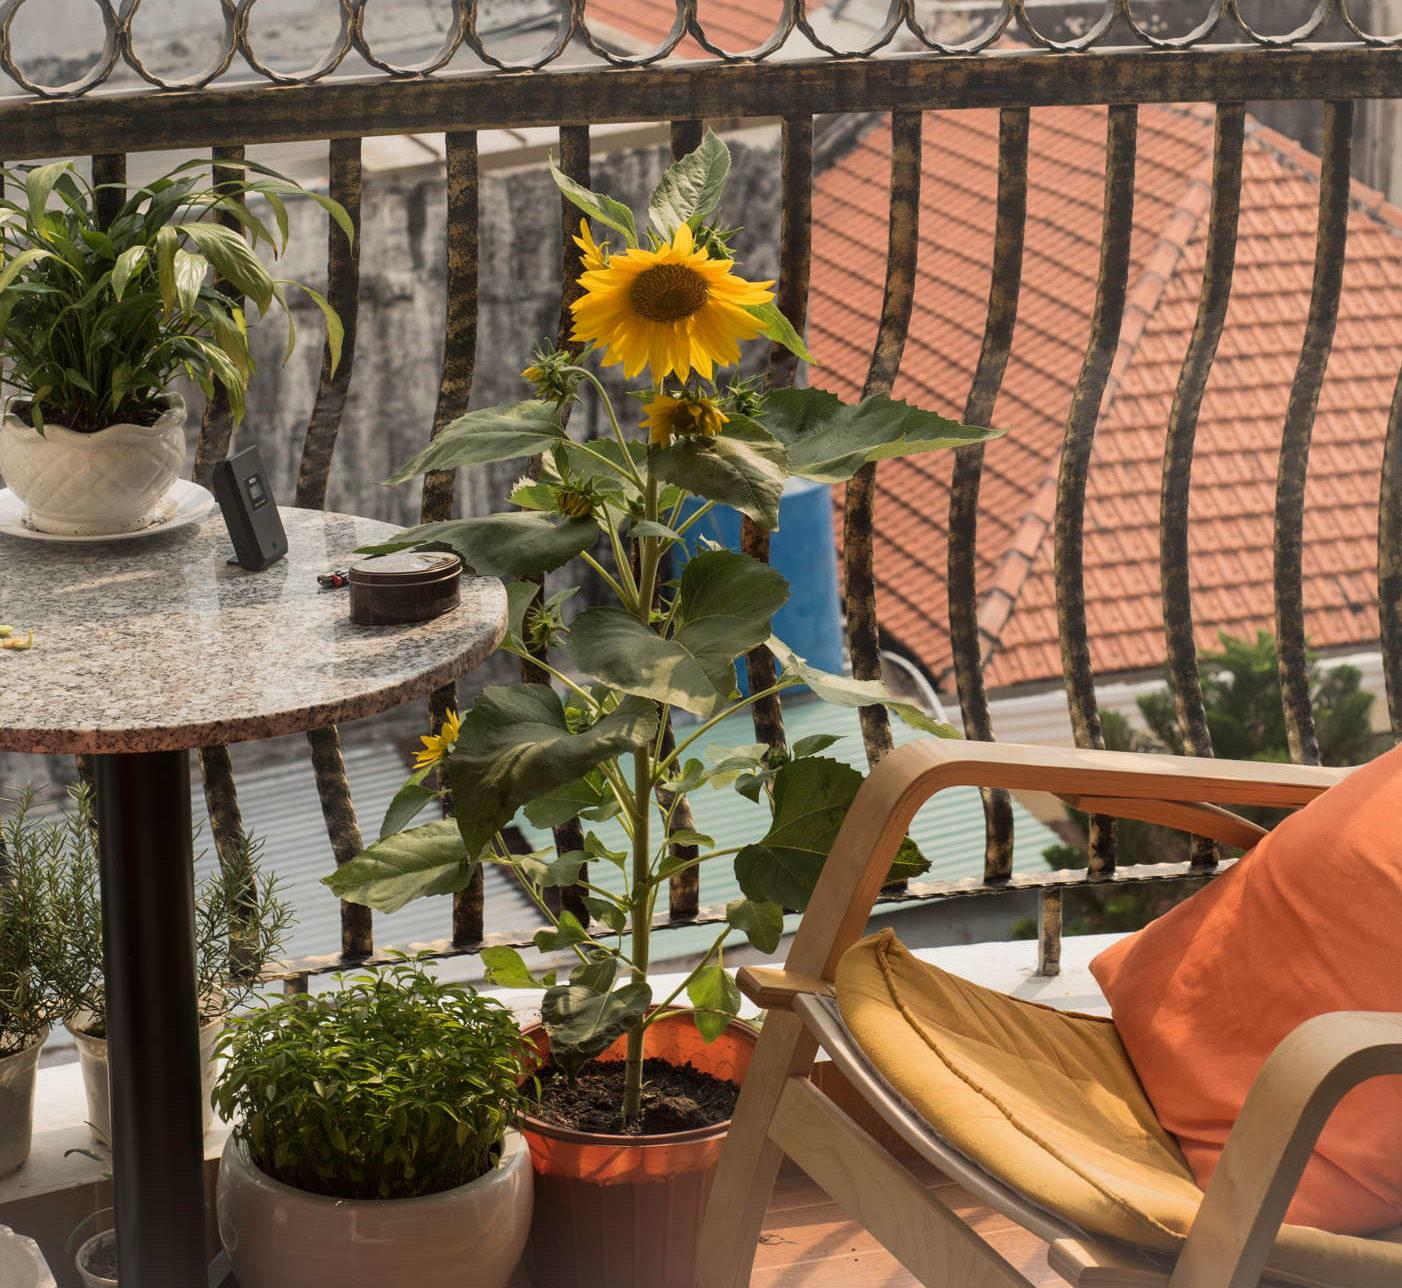 sonnenblumen pflanzen anleitung f r topf beet balkon plantura. Black Bedroom Furniture Sets. Home Design Ideas